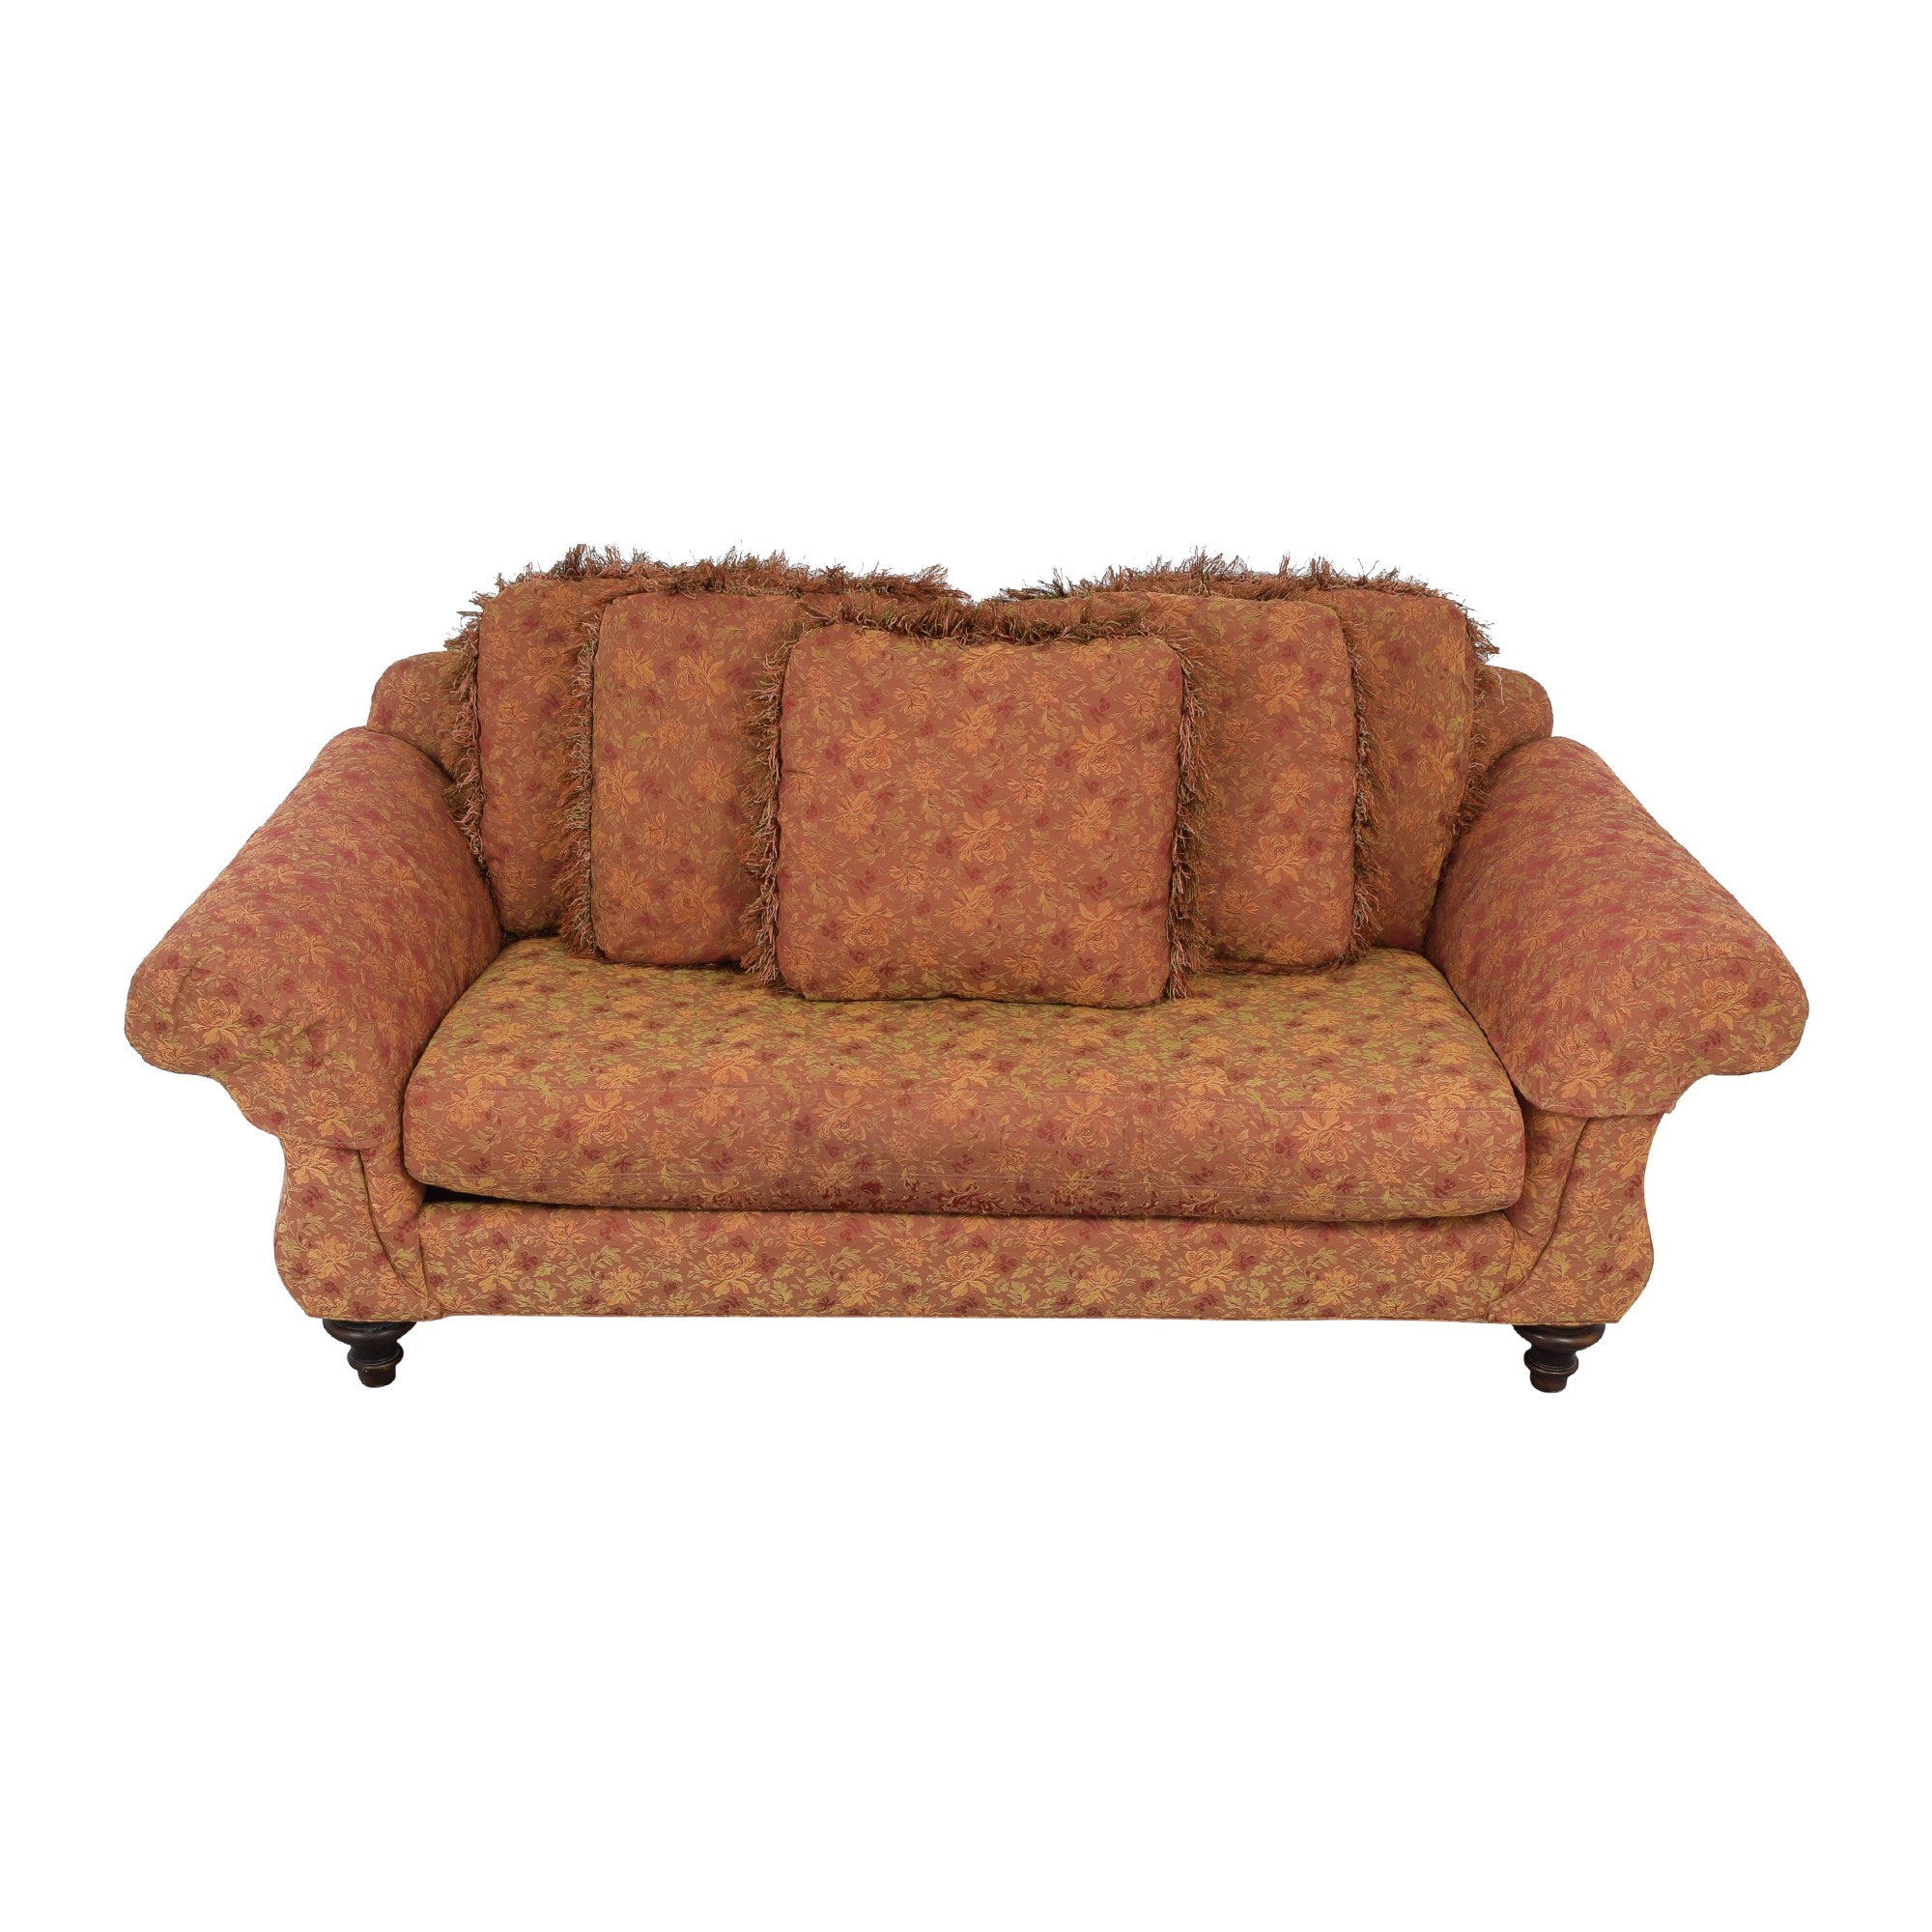 Vanguard Furniture Vanguard Single Cushion Sofa pa